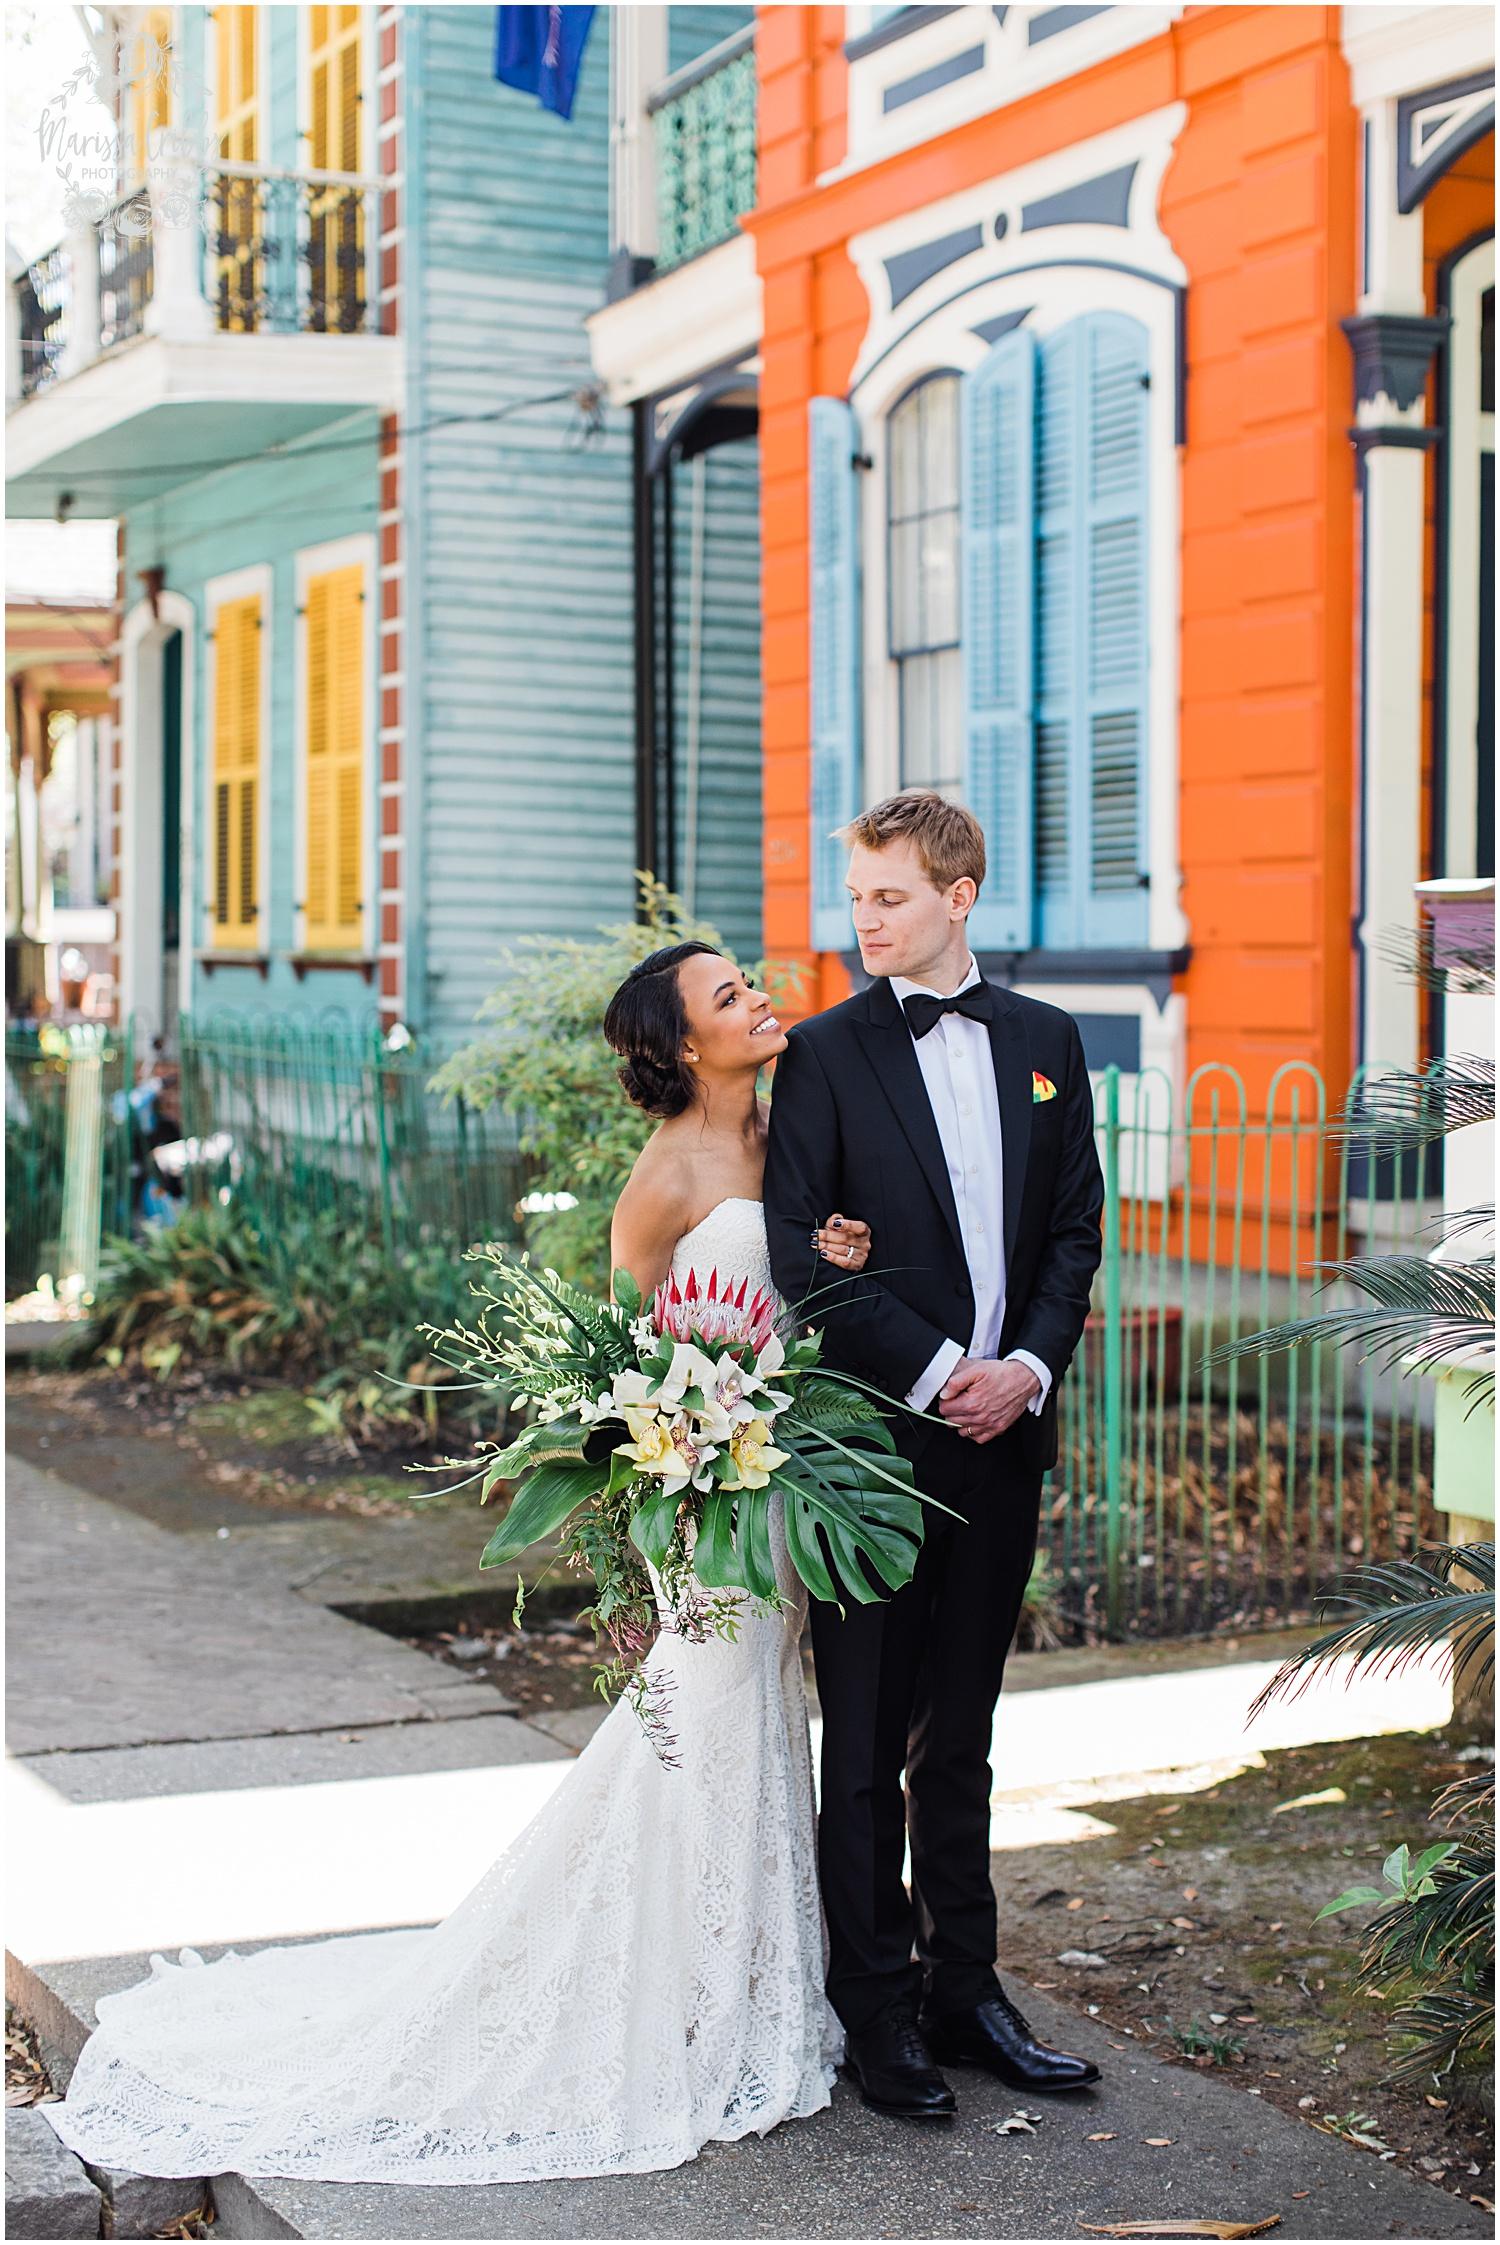 NEW ORLEANS WEDDING   BENACHI HOUSE   SARAH & MICHAEL   MARISSA CRIBBS PHOTOGRAPHY_4417.jpg